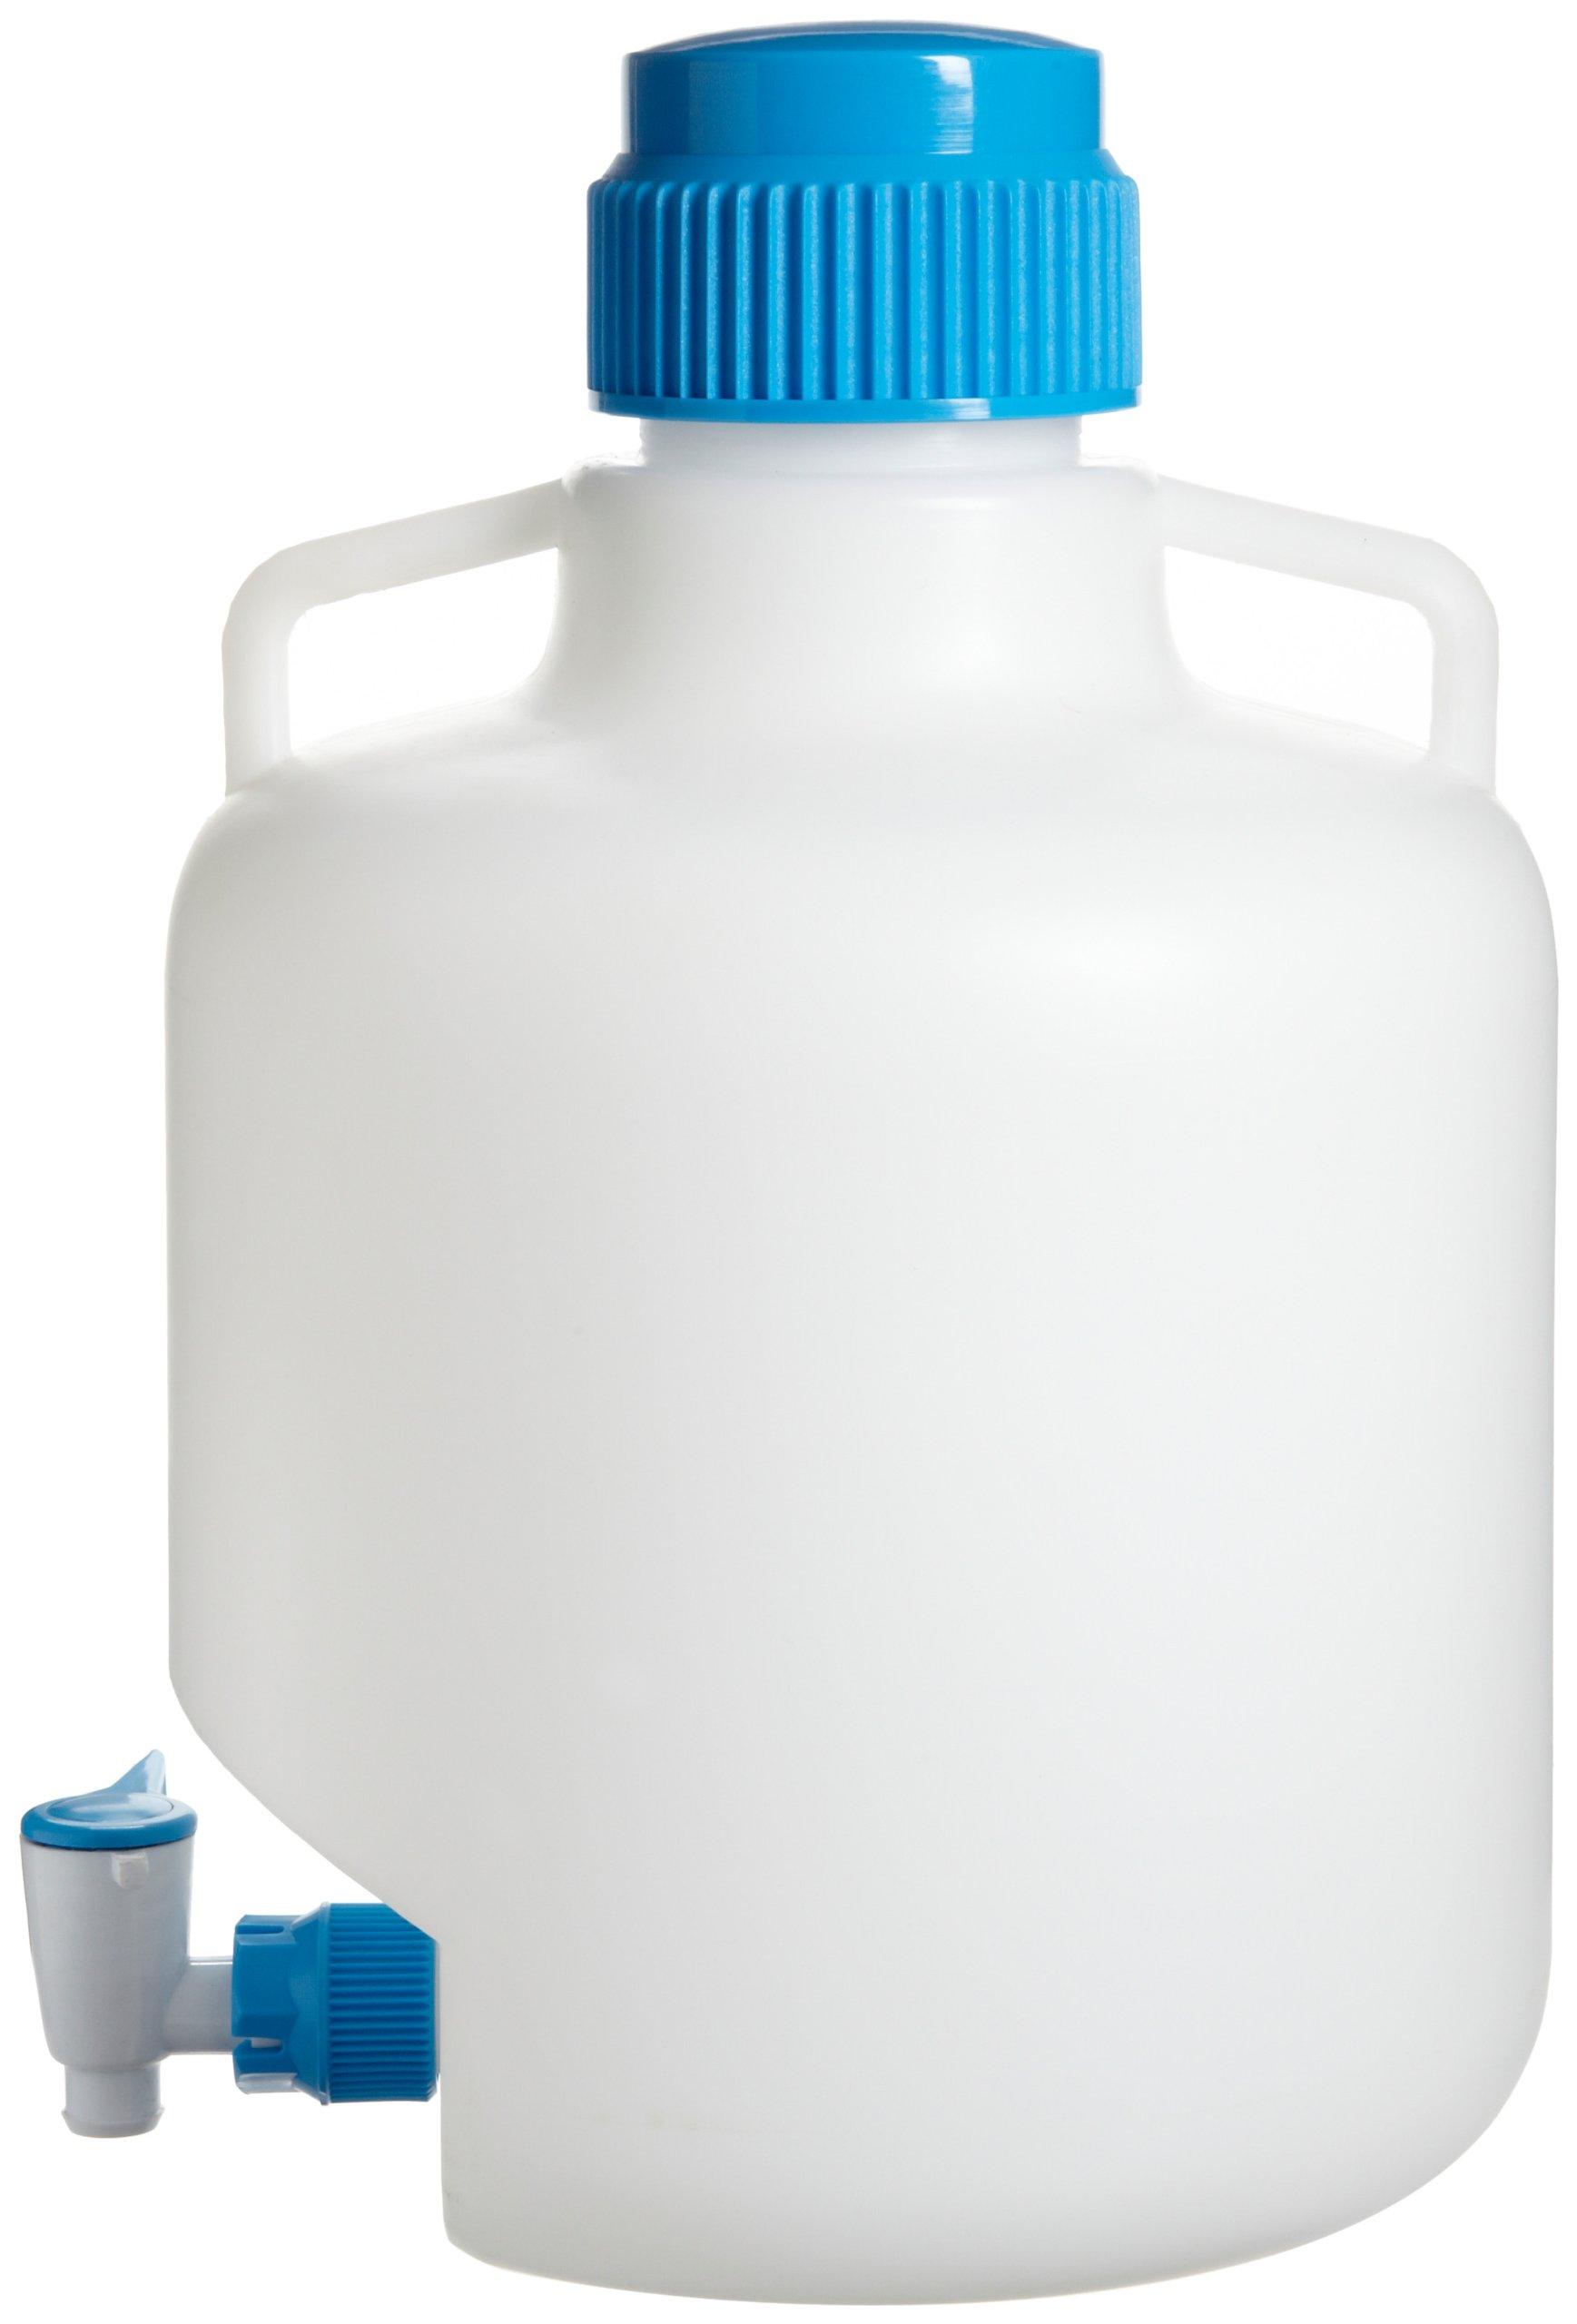 Bel-Art Autoclavable Polypropylene Carboy with Spigot; 10 Liters (2.6 Gallons) (F11846-0025)